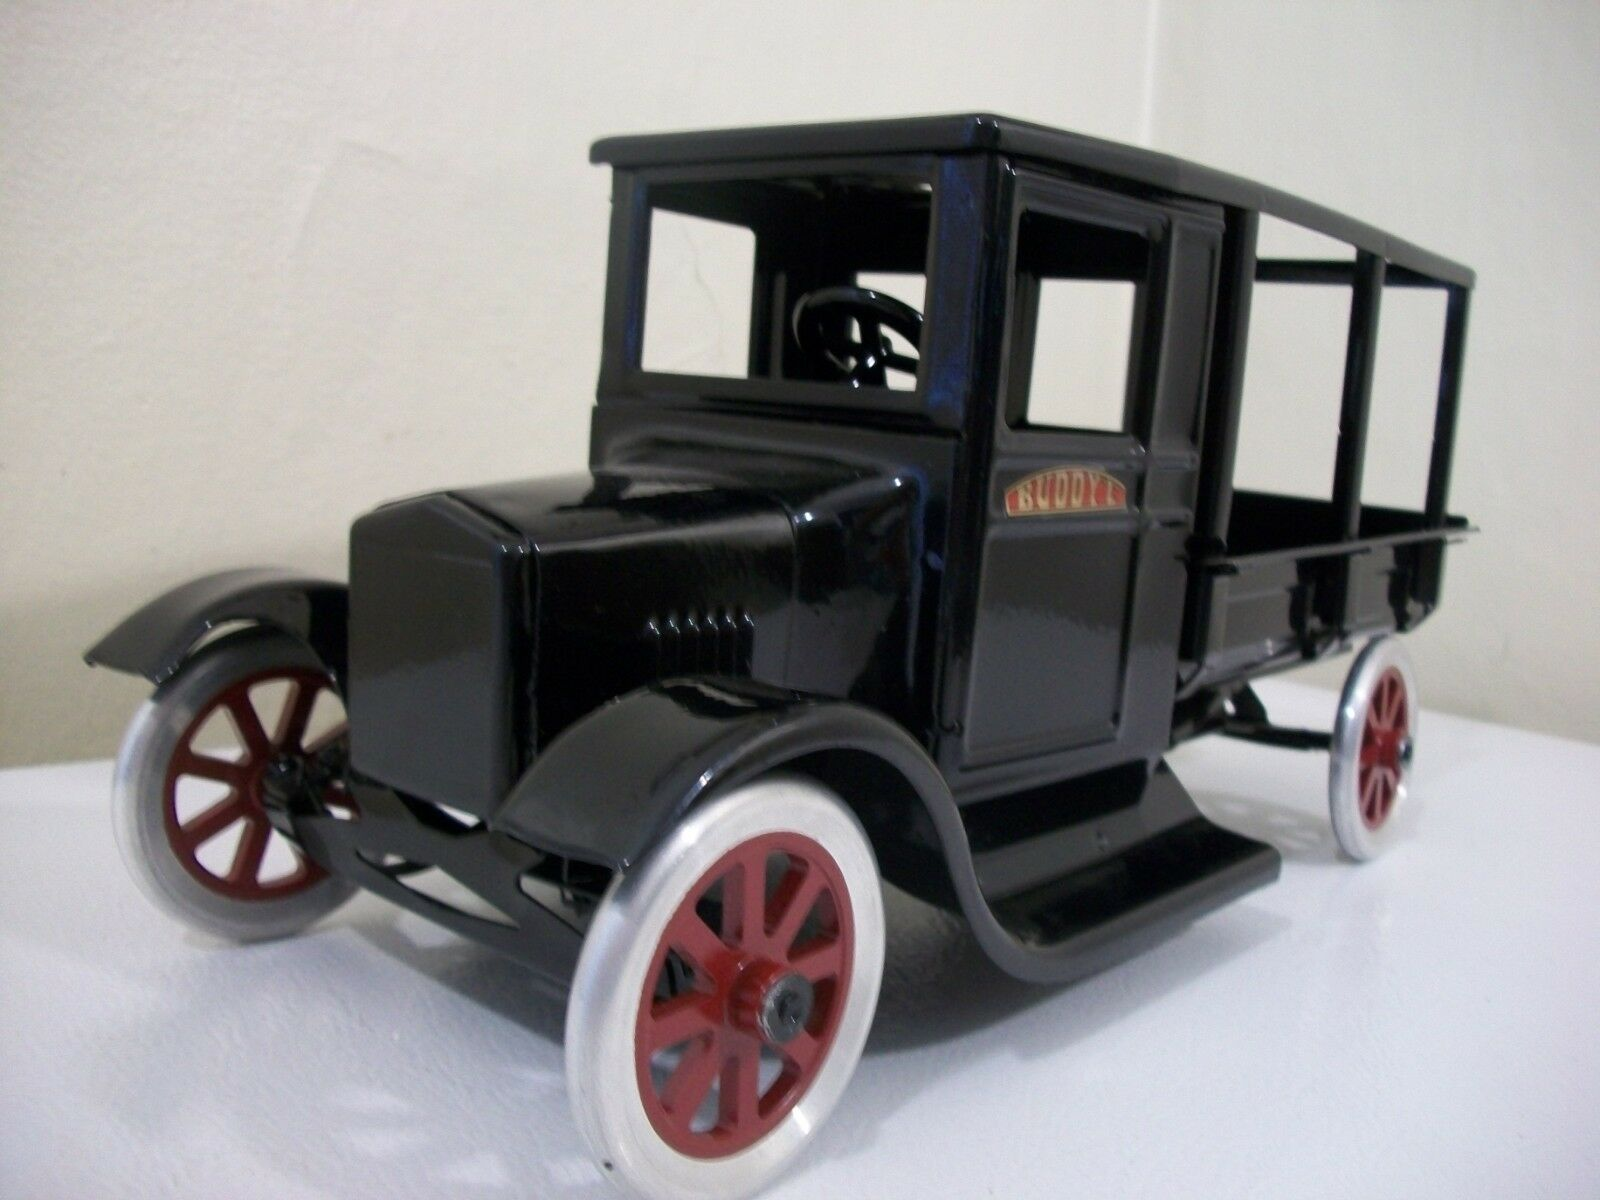 Buddy L Flivver vender Camioneta Ford Modelo T T-Reproducción